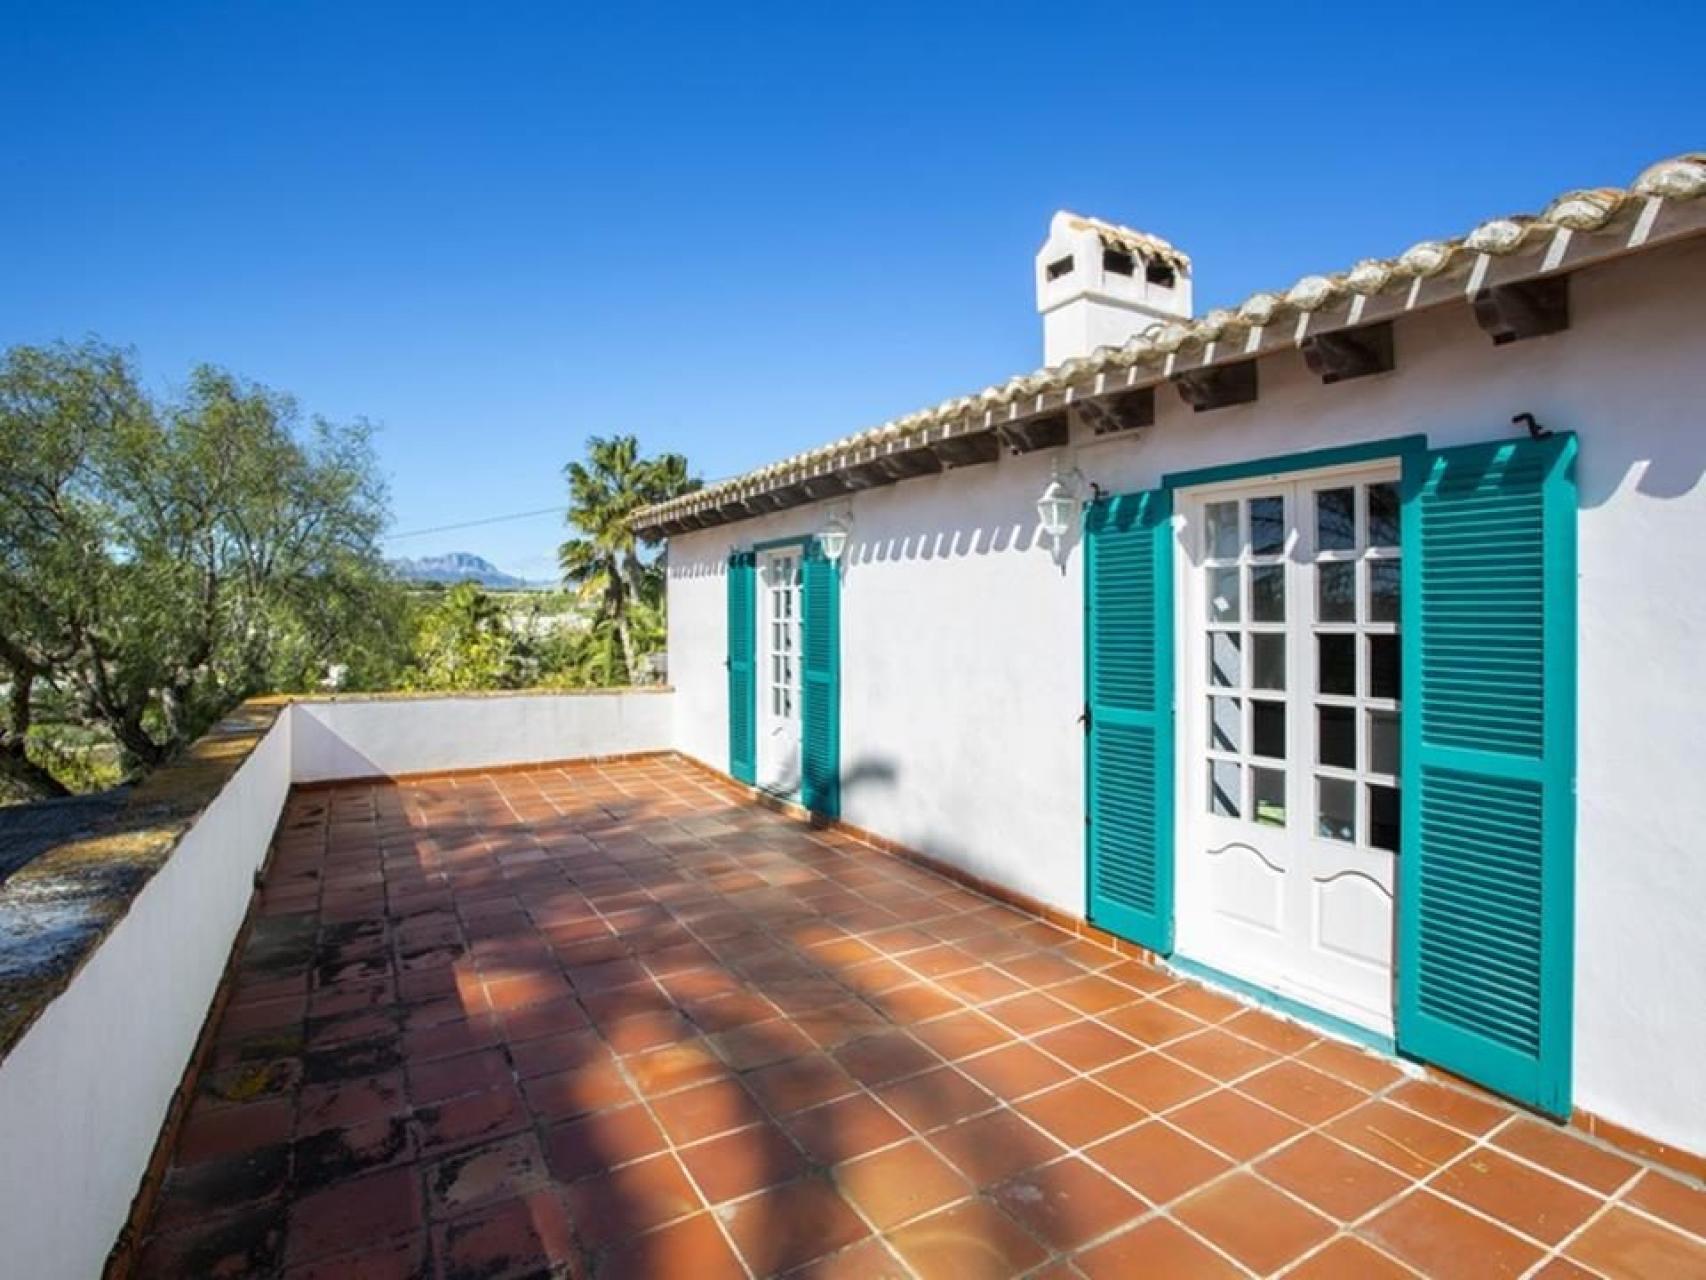 Fotogalería - 2 - Build a villa in Moraira: villas for sale in Moraira